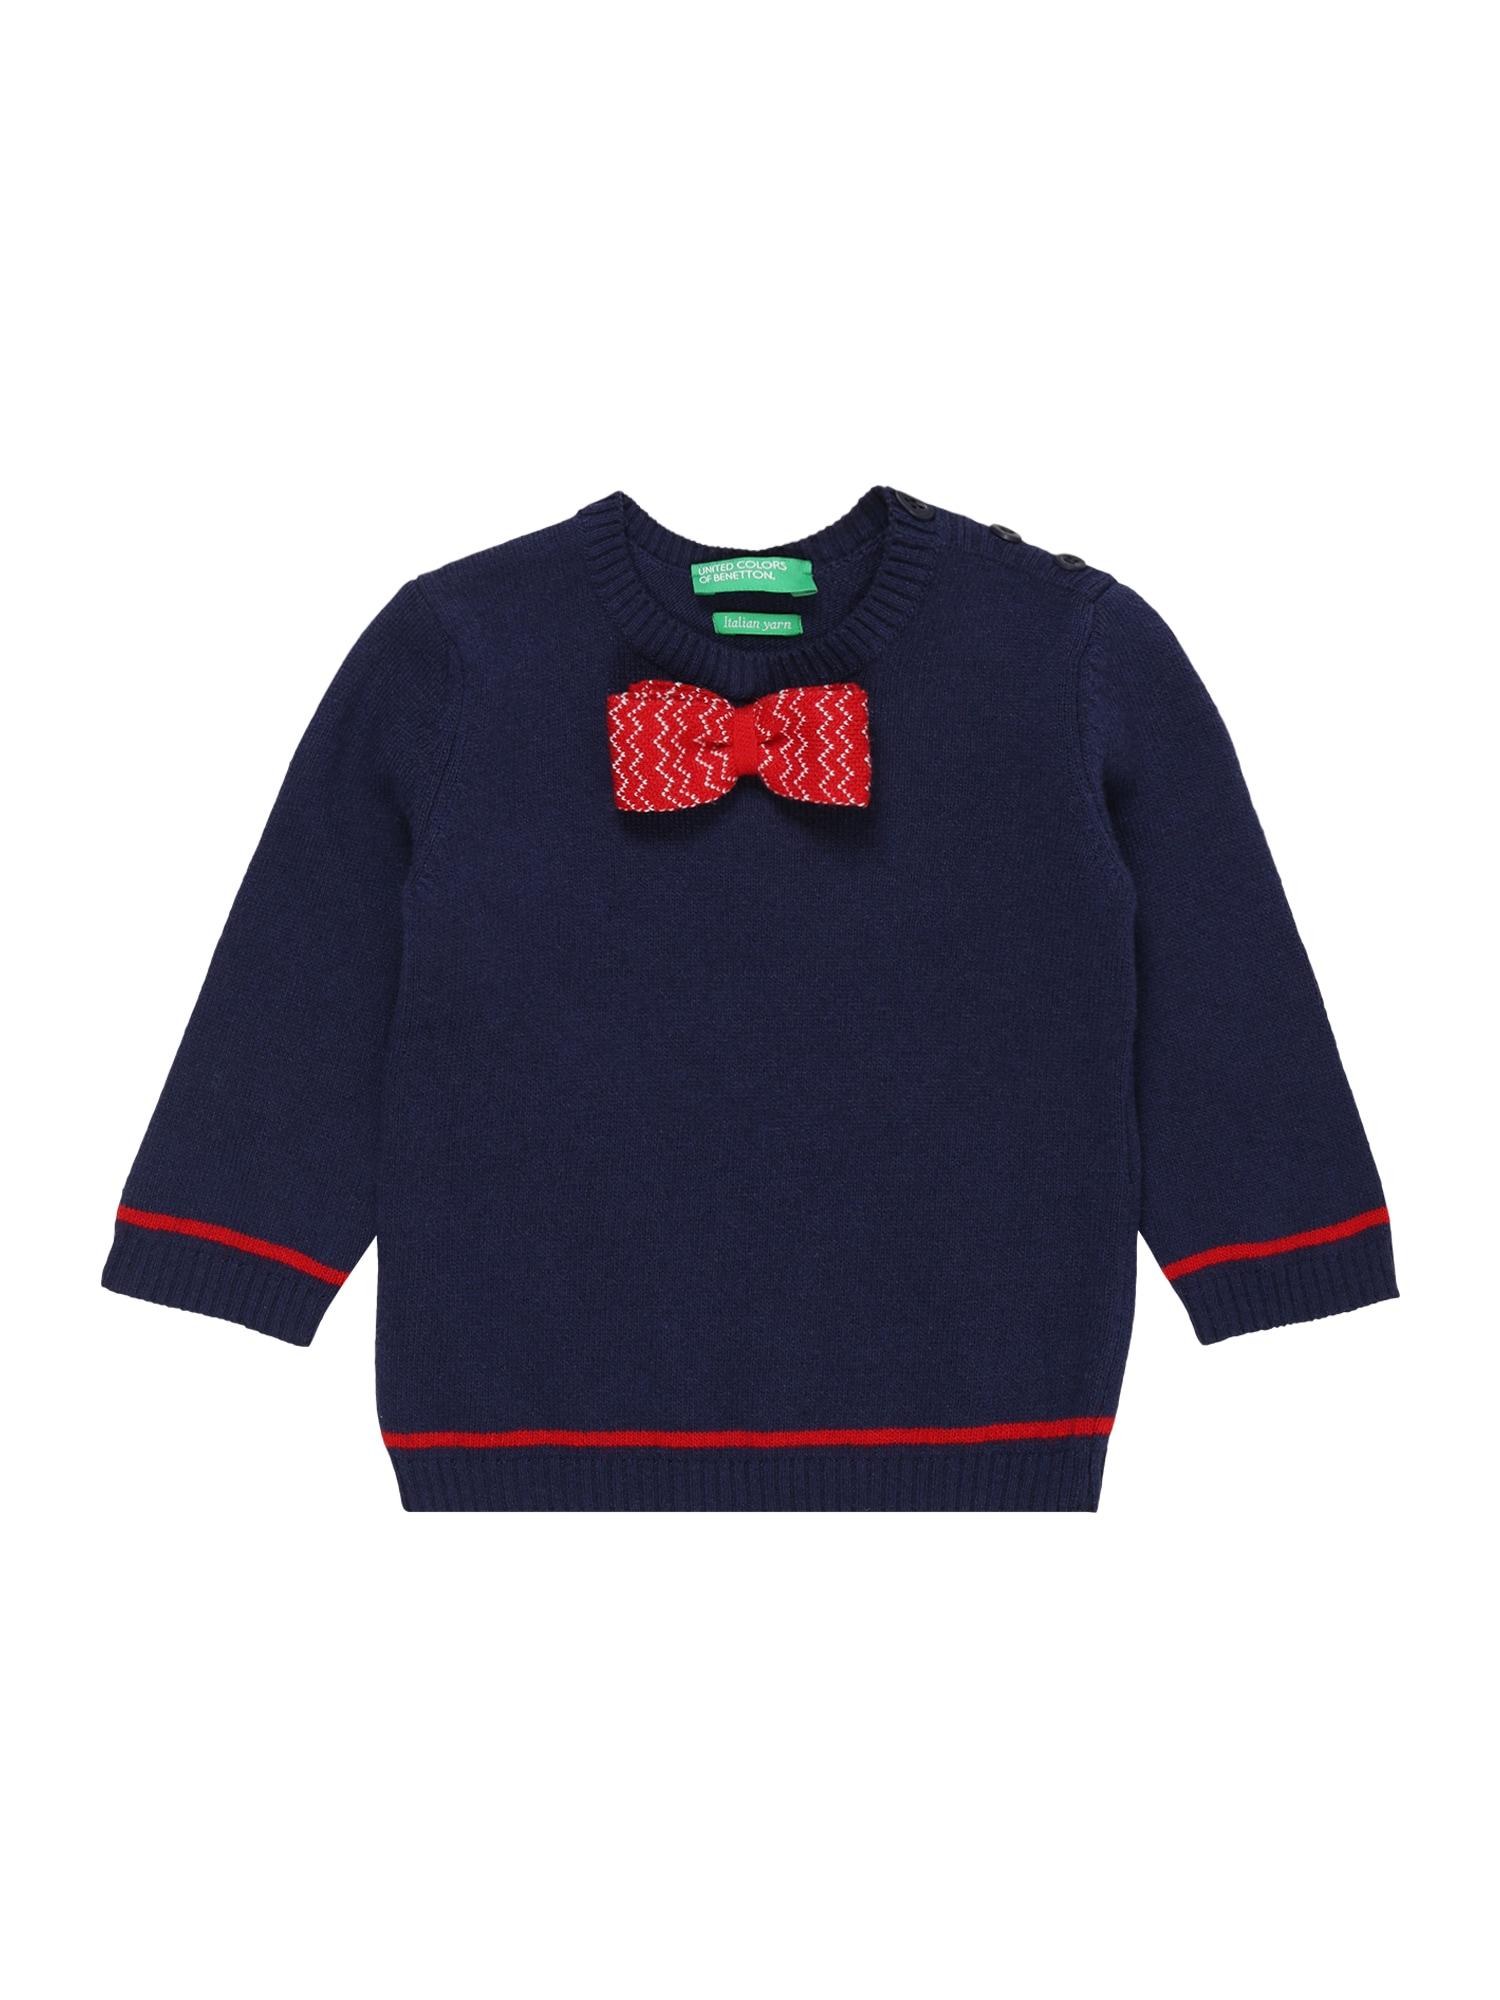 UNITED COLORS OF BENETTON Megztinis mėlyna / raudona